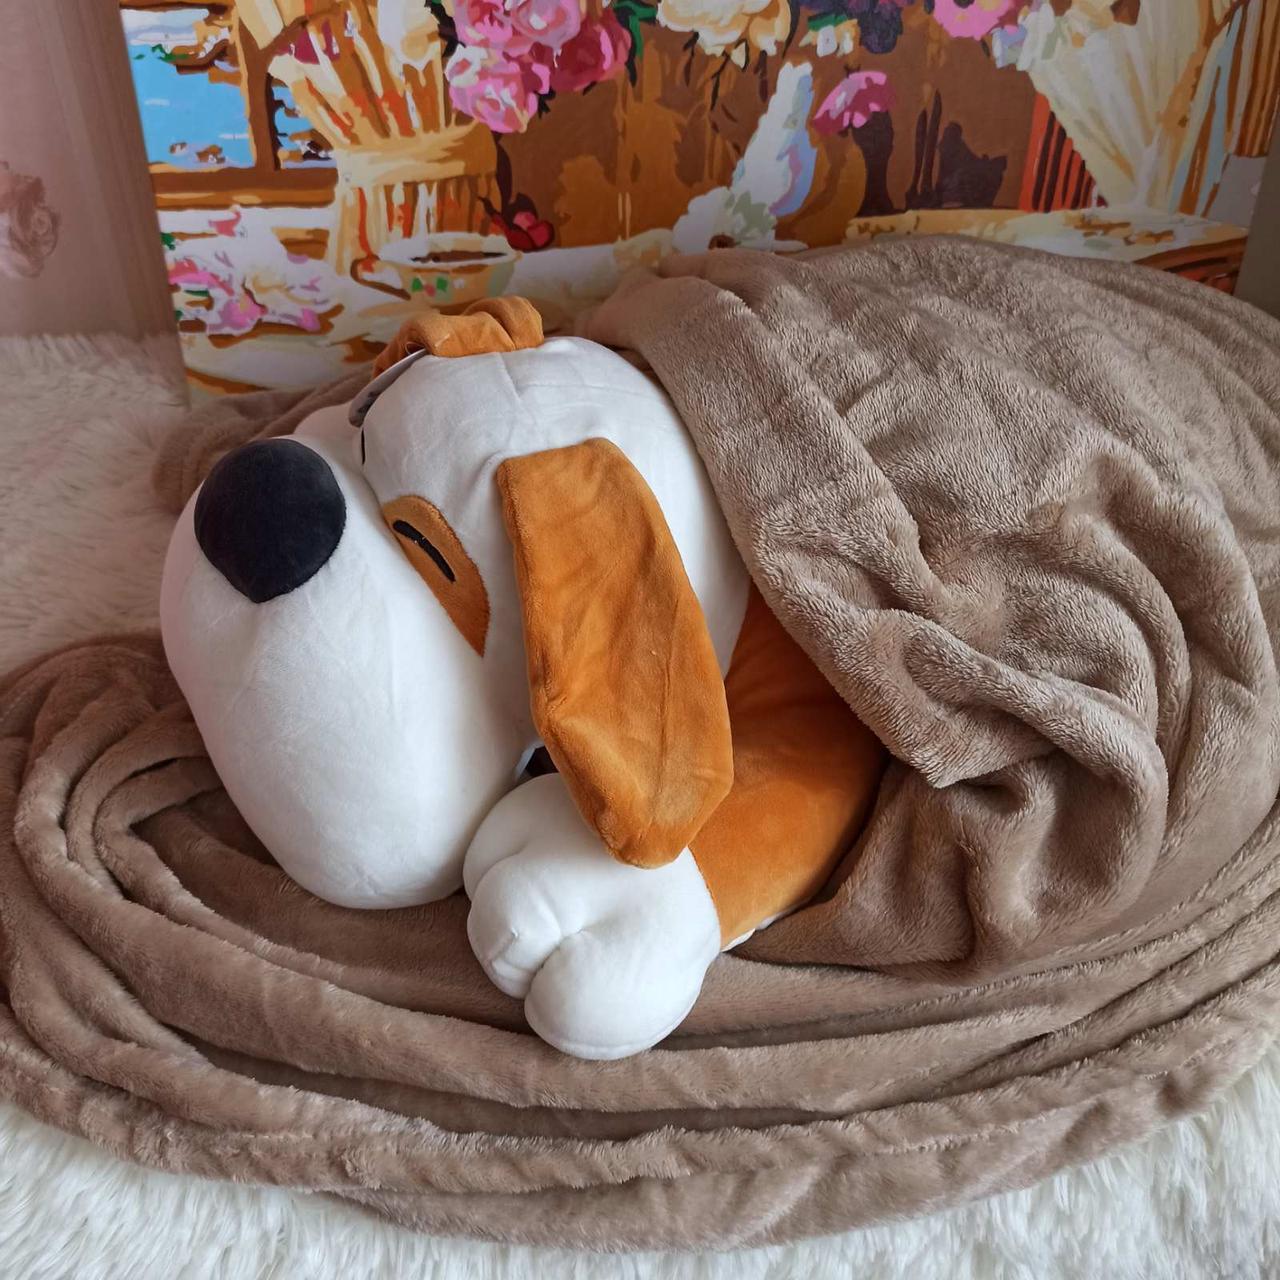 Плед игрушка подушка 3 в1 Собачка   Игрушка детский плед   Игрушки-Подушки   Мягкая игрушка Оранжевого цвета